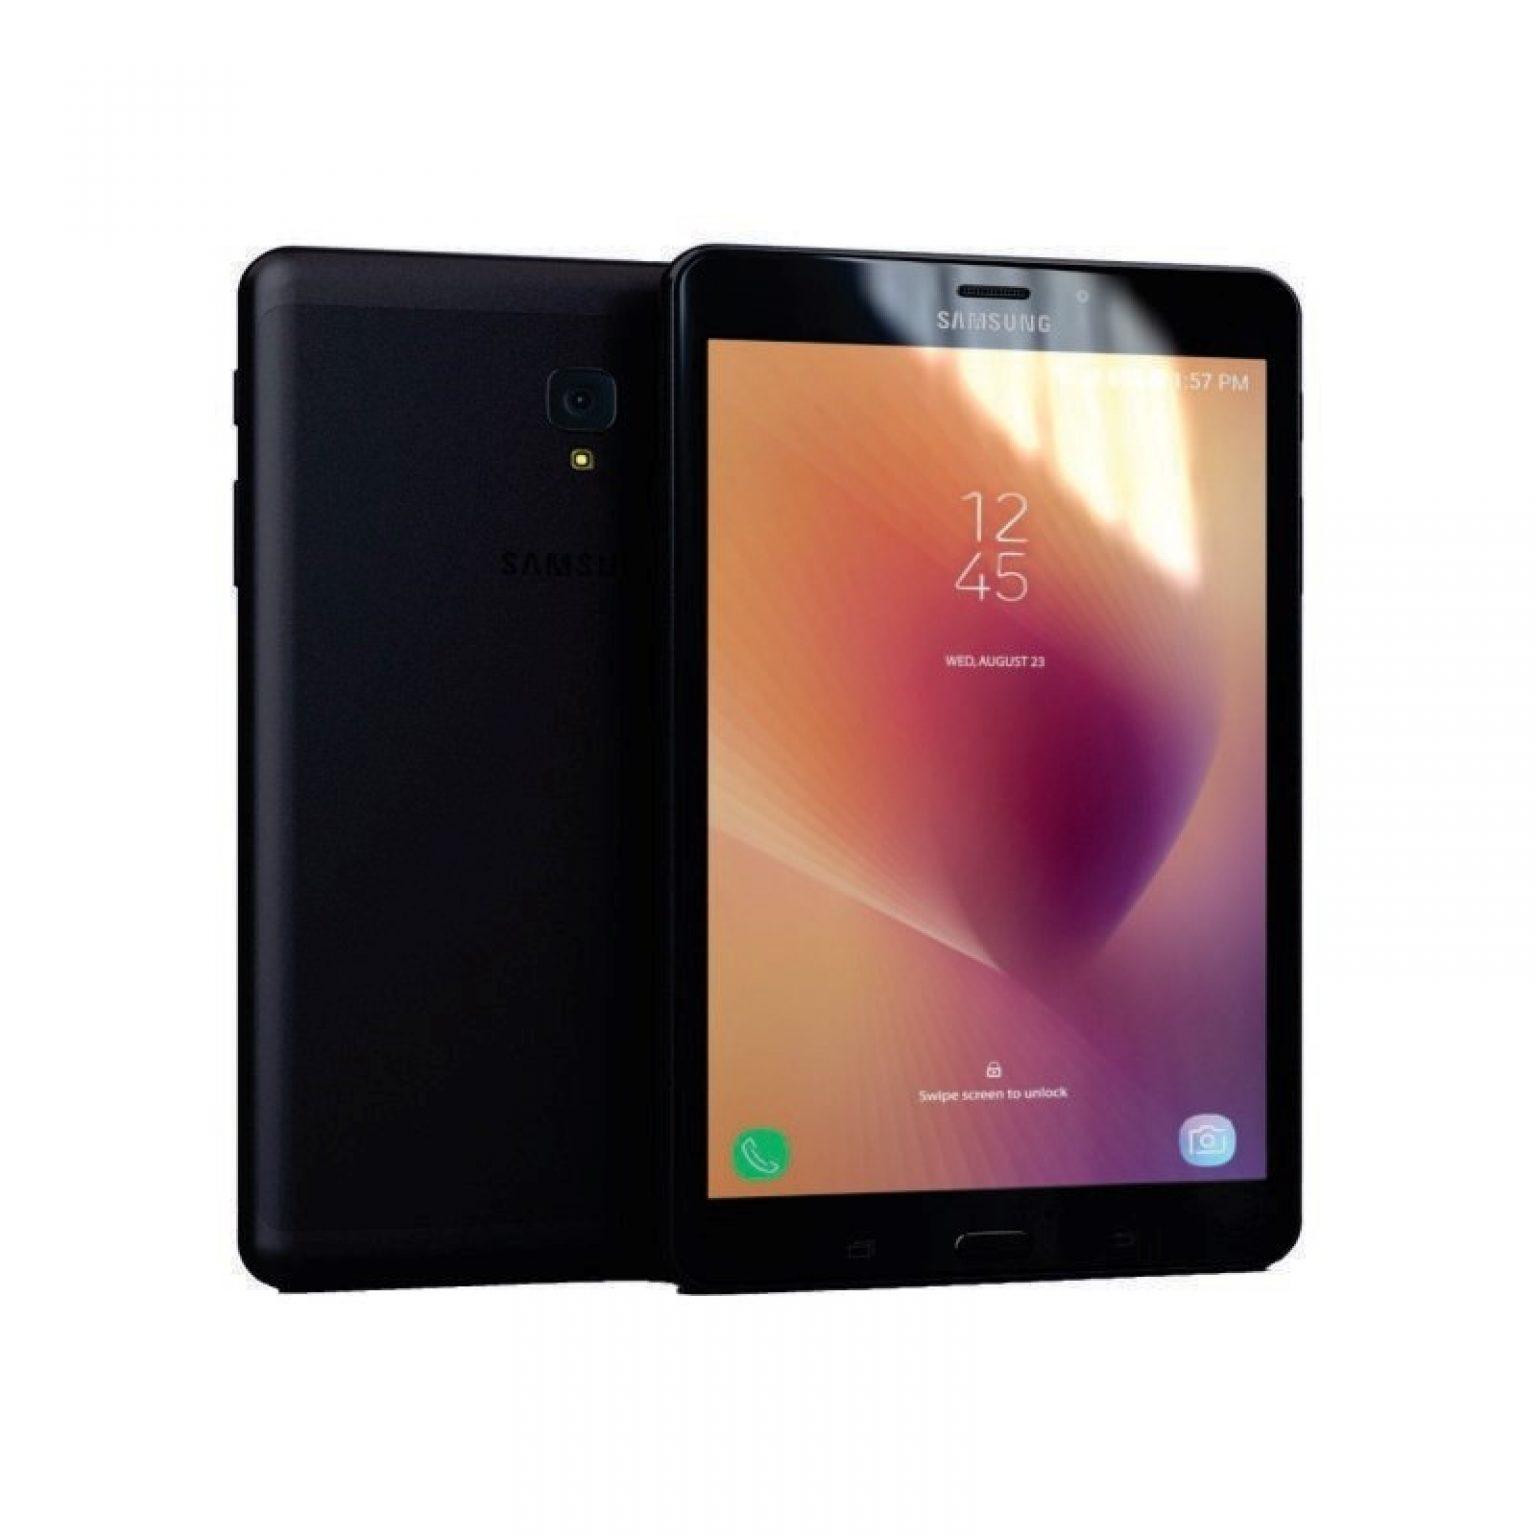 SAMSUNG - Tab A 8 Inchi 2017 black [SM-T385NZKAXID]